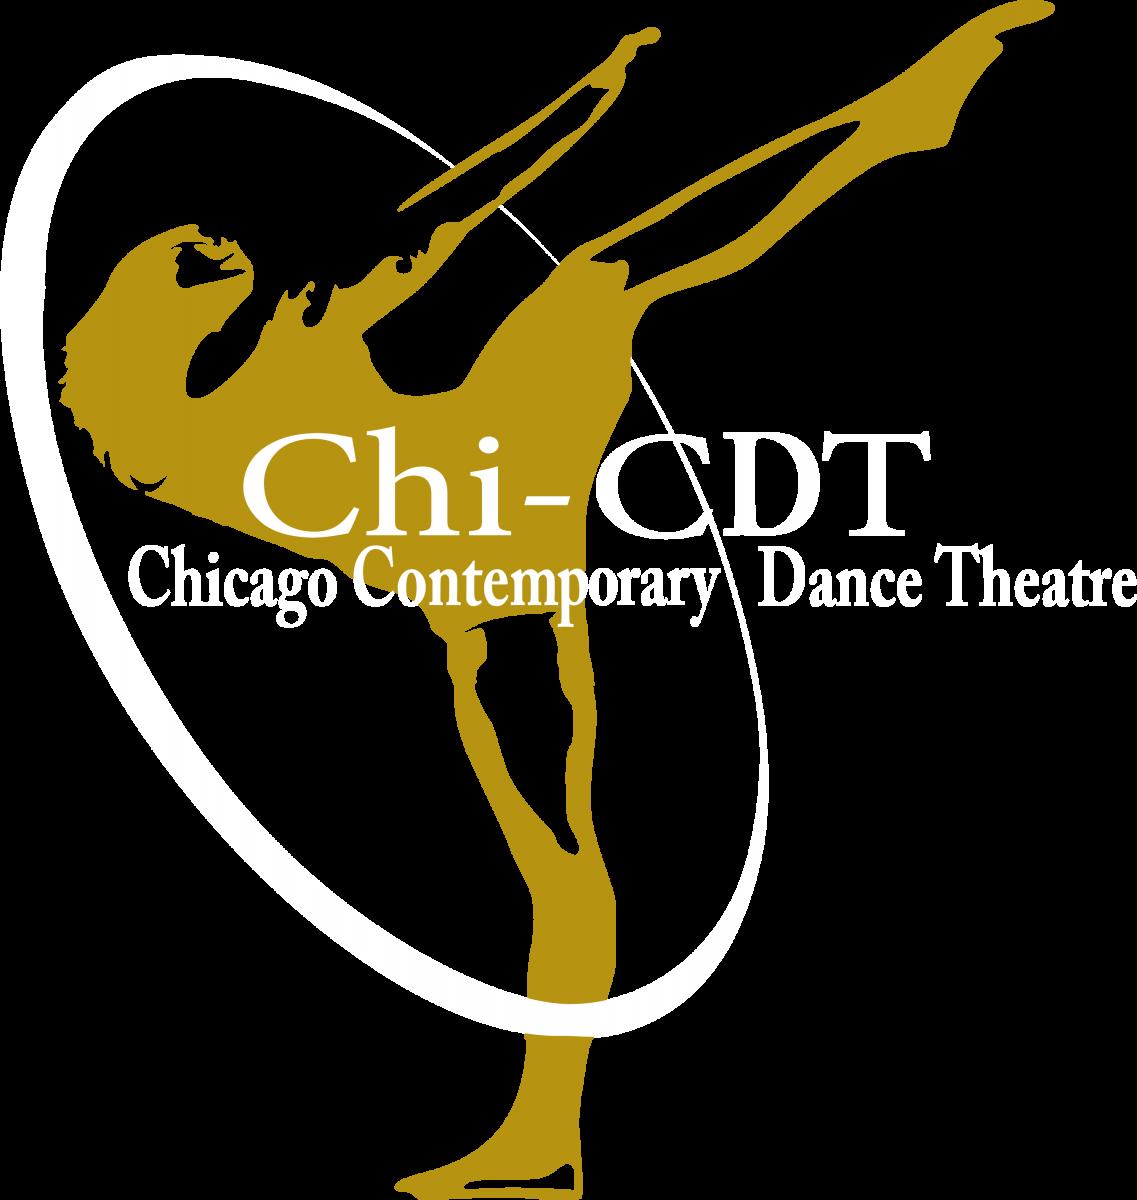 Dancer clipart contemporary dance. Chicago theatre logo